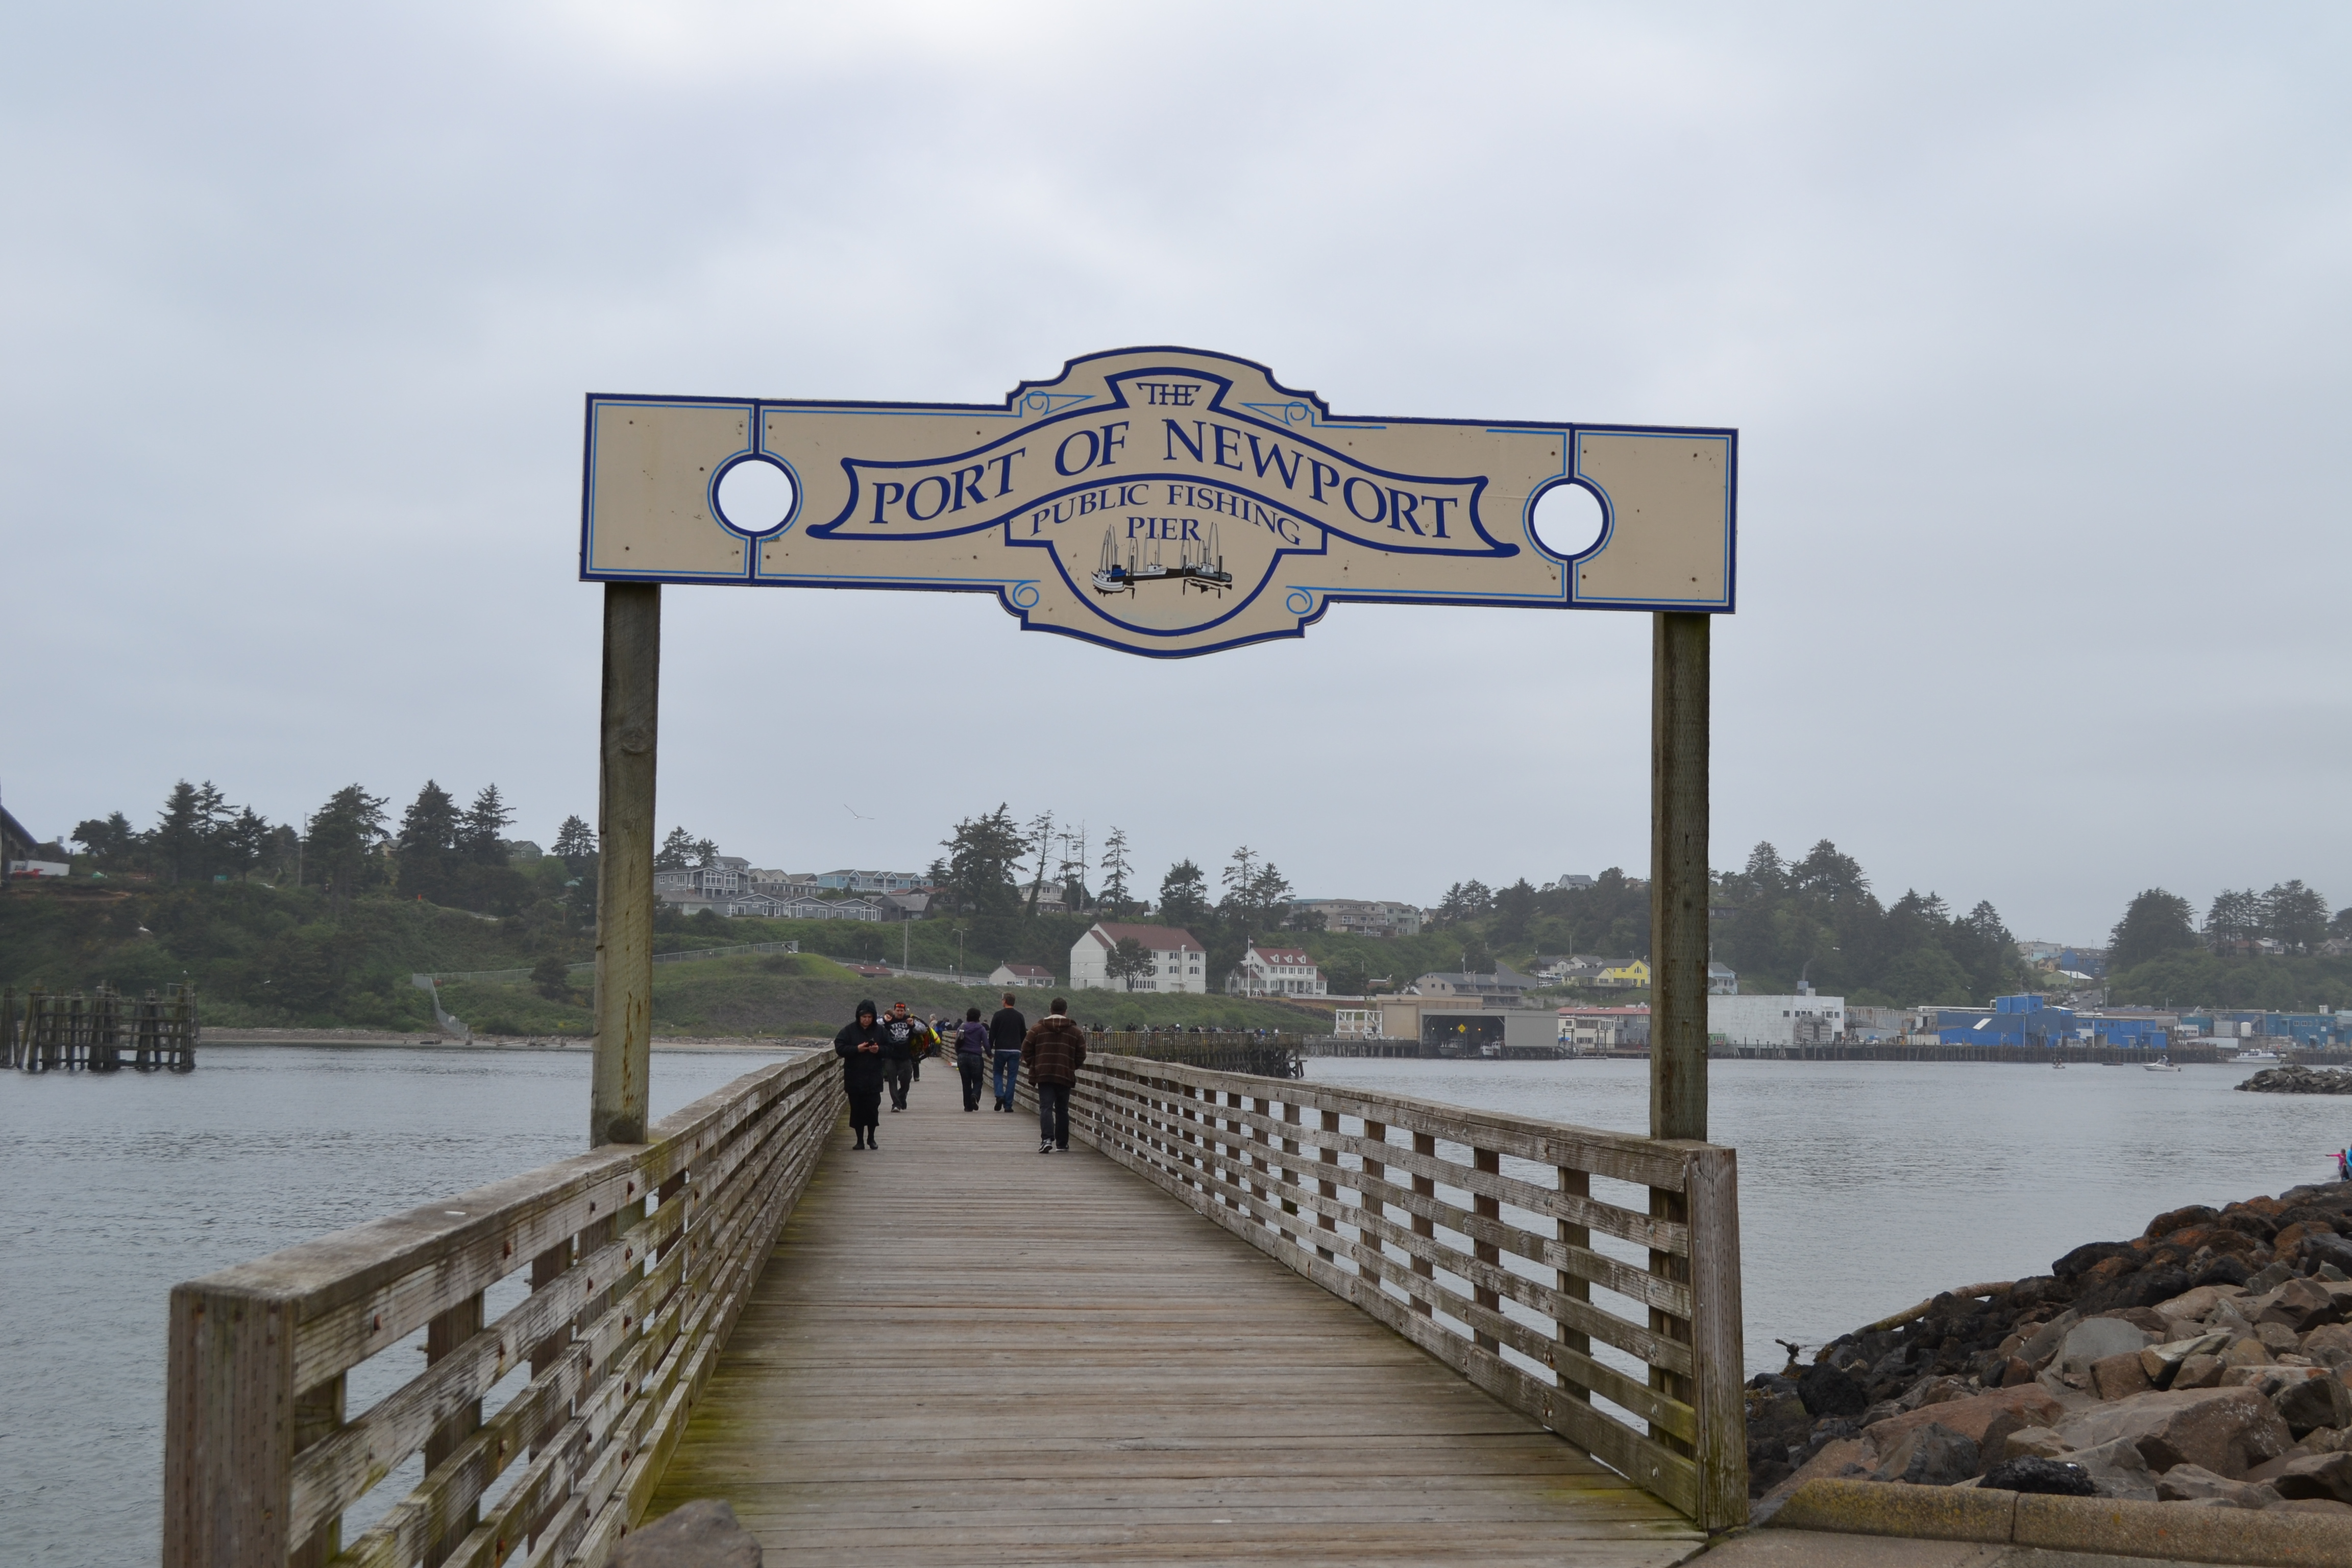 Crabbing and Fishing Pier